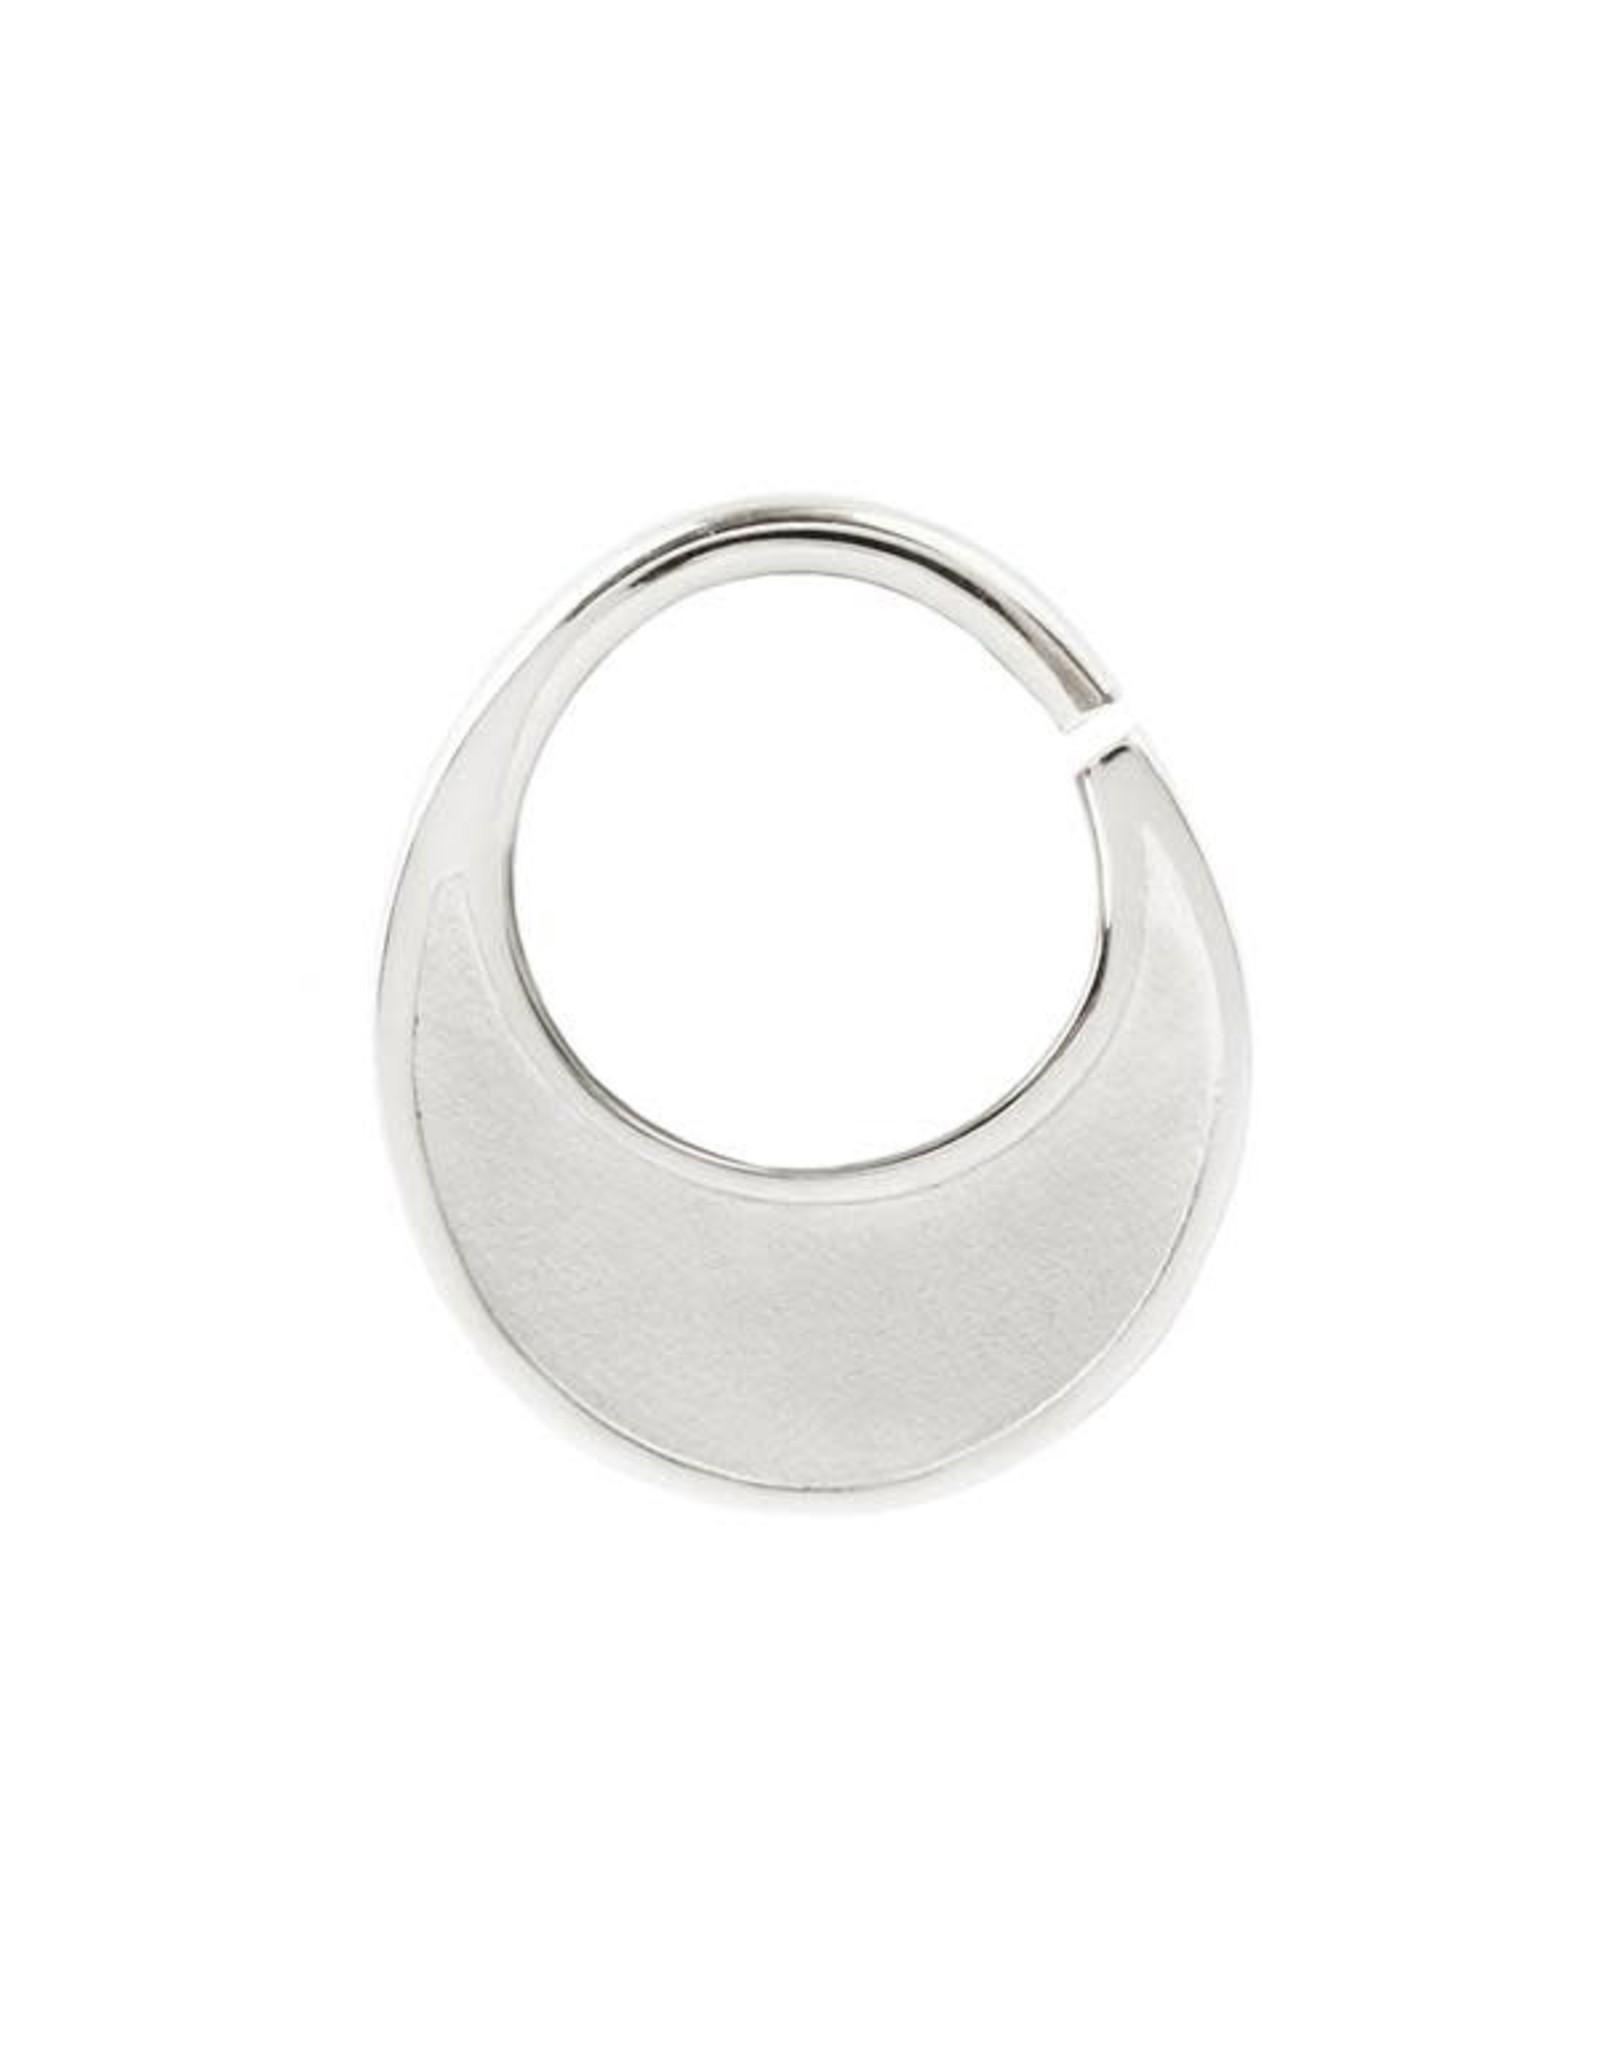 "Buddha Jewelry Organics 16g 5/16 Buddha Jewelry Organics ""Sandblasted Haute"" seam ring"